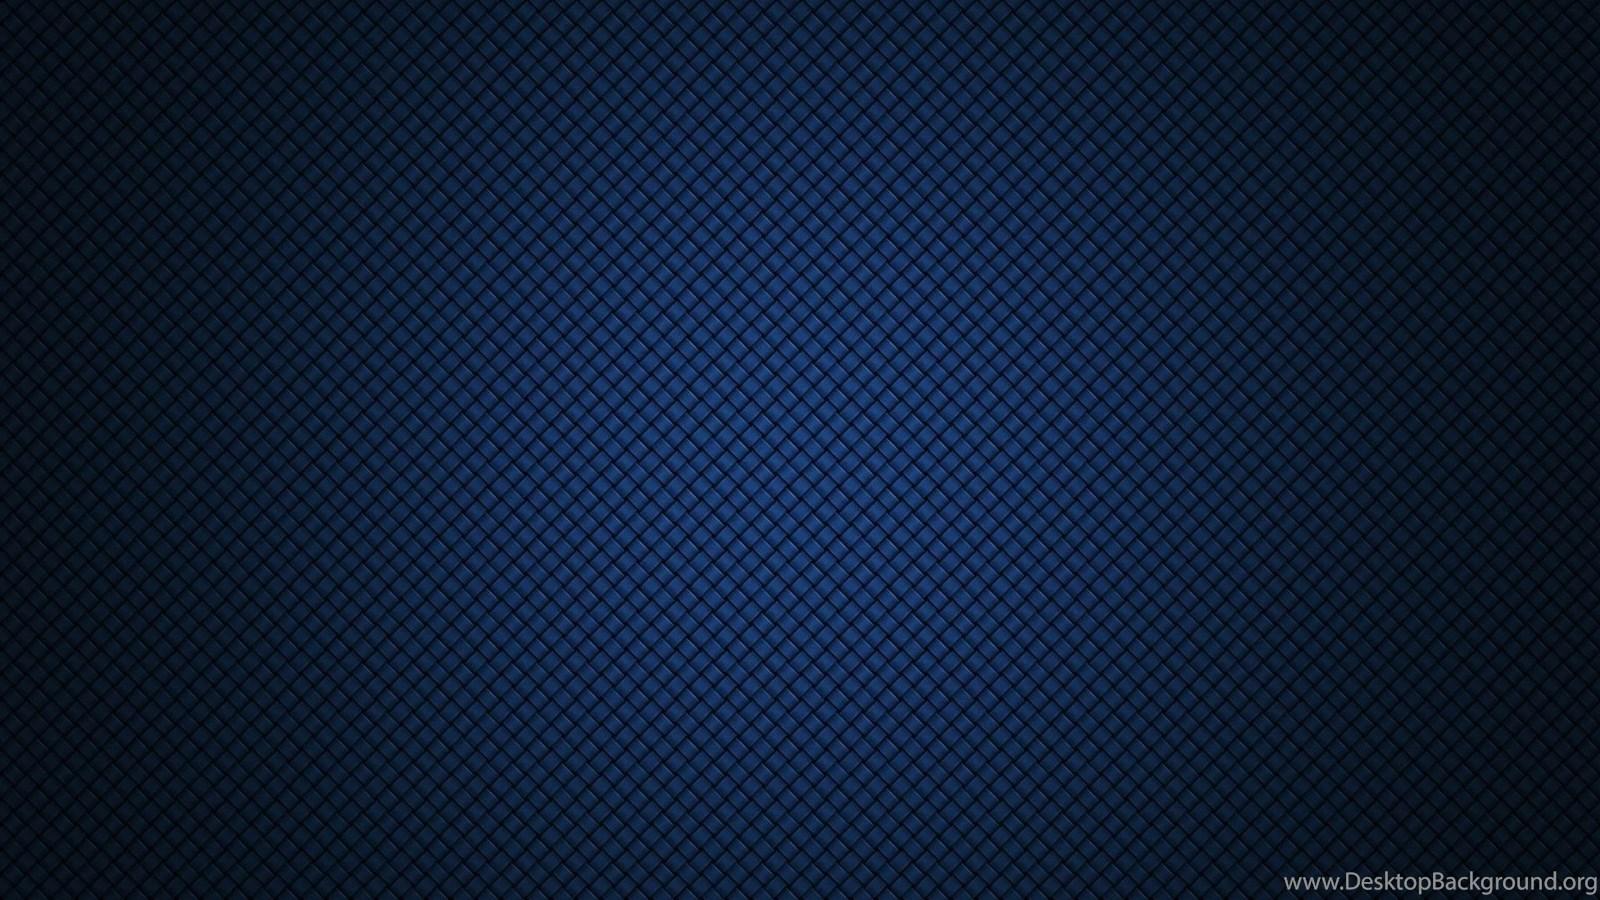 Dark Blue Checks Plain HD Wallpapers Desktop Background